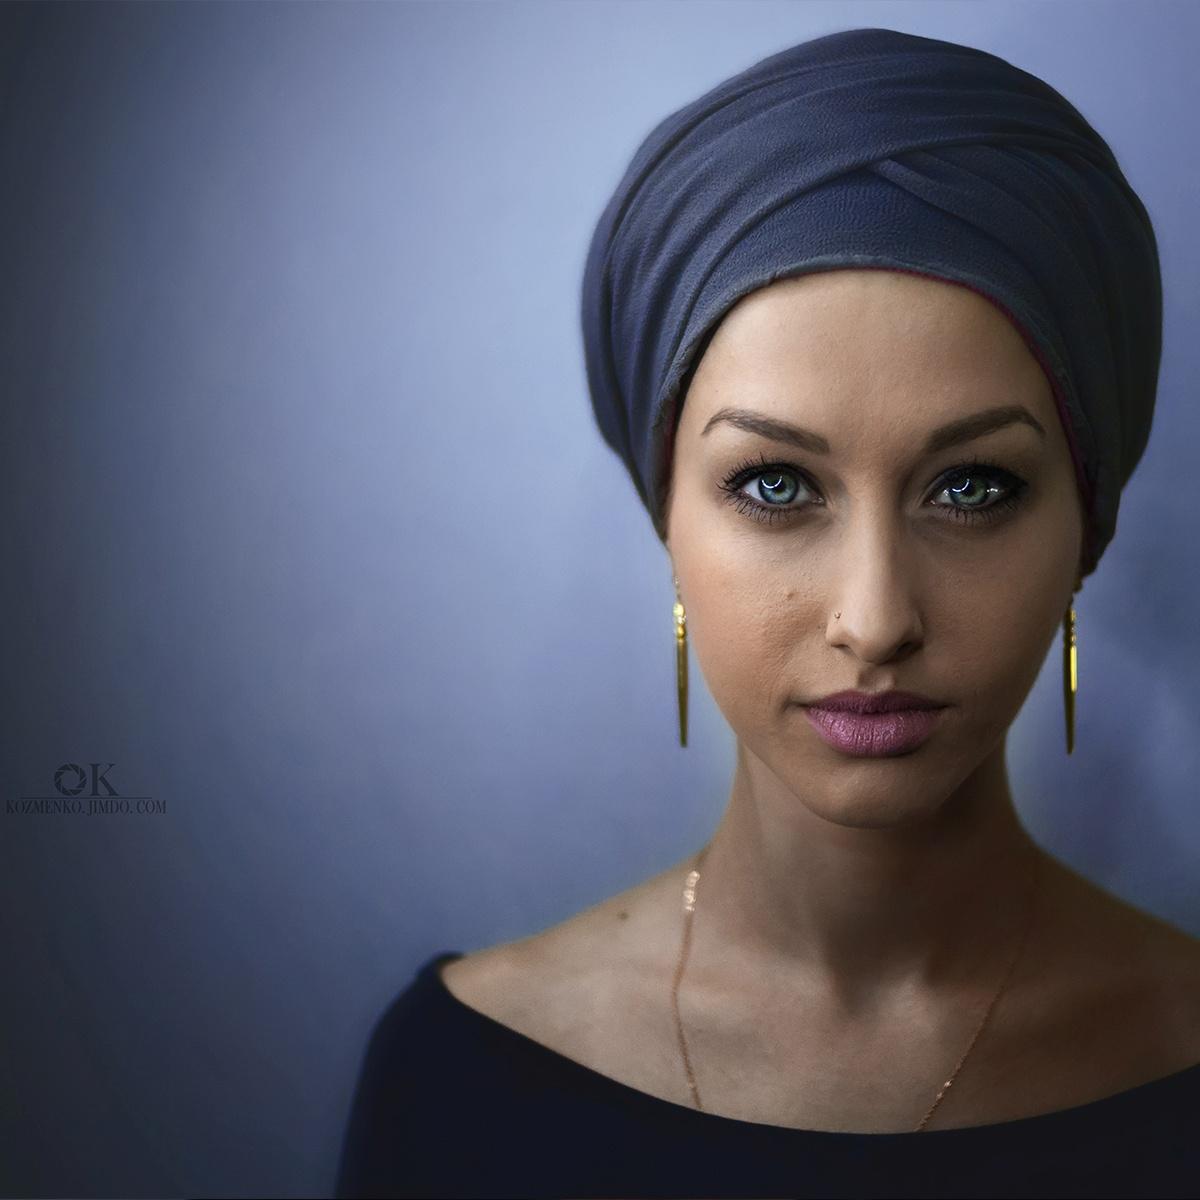 portrait photography by oleksandr kozmenko